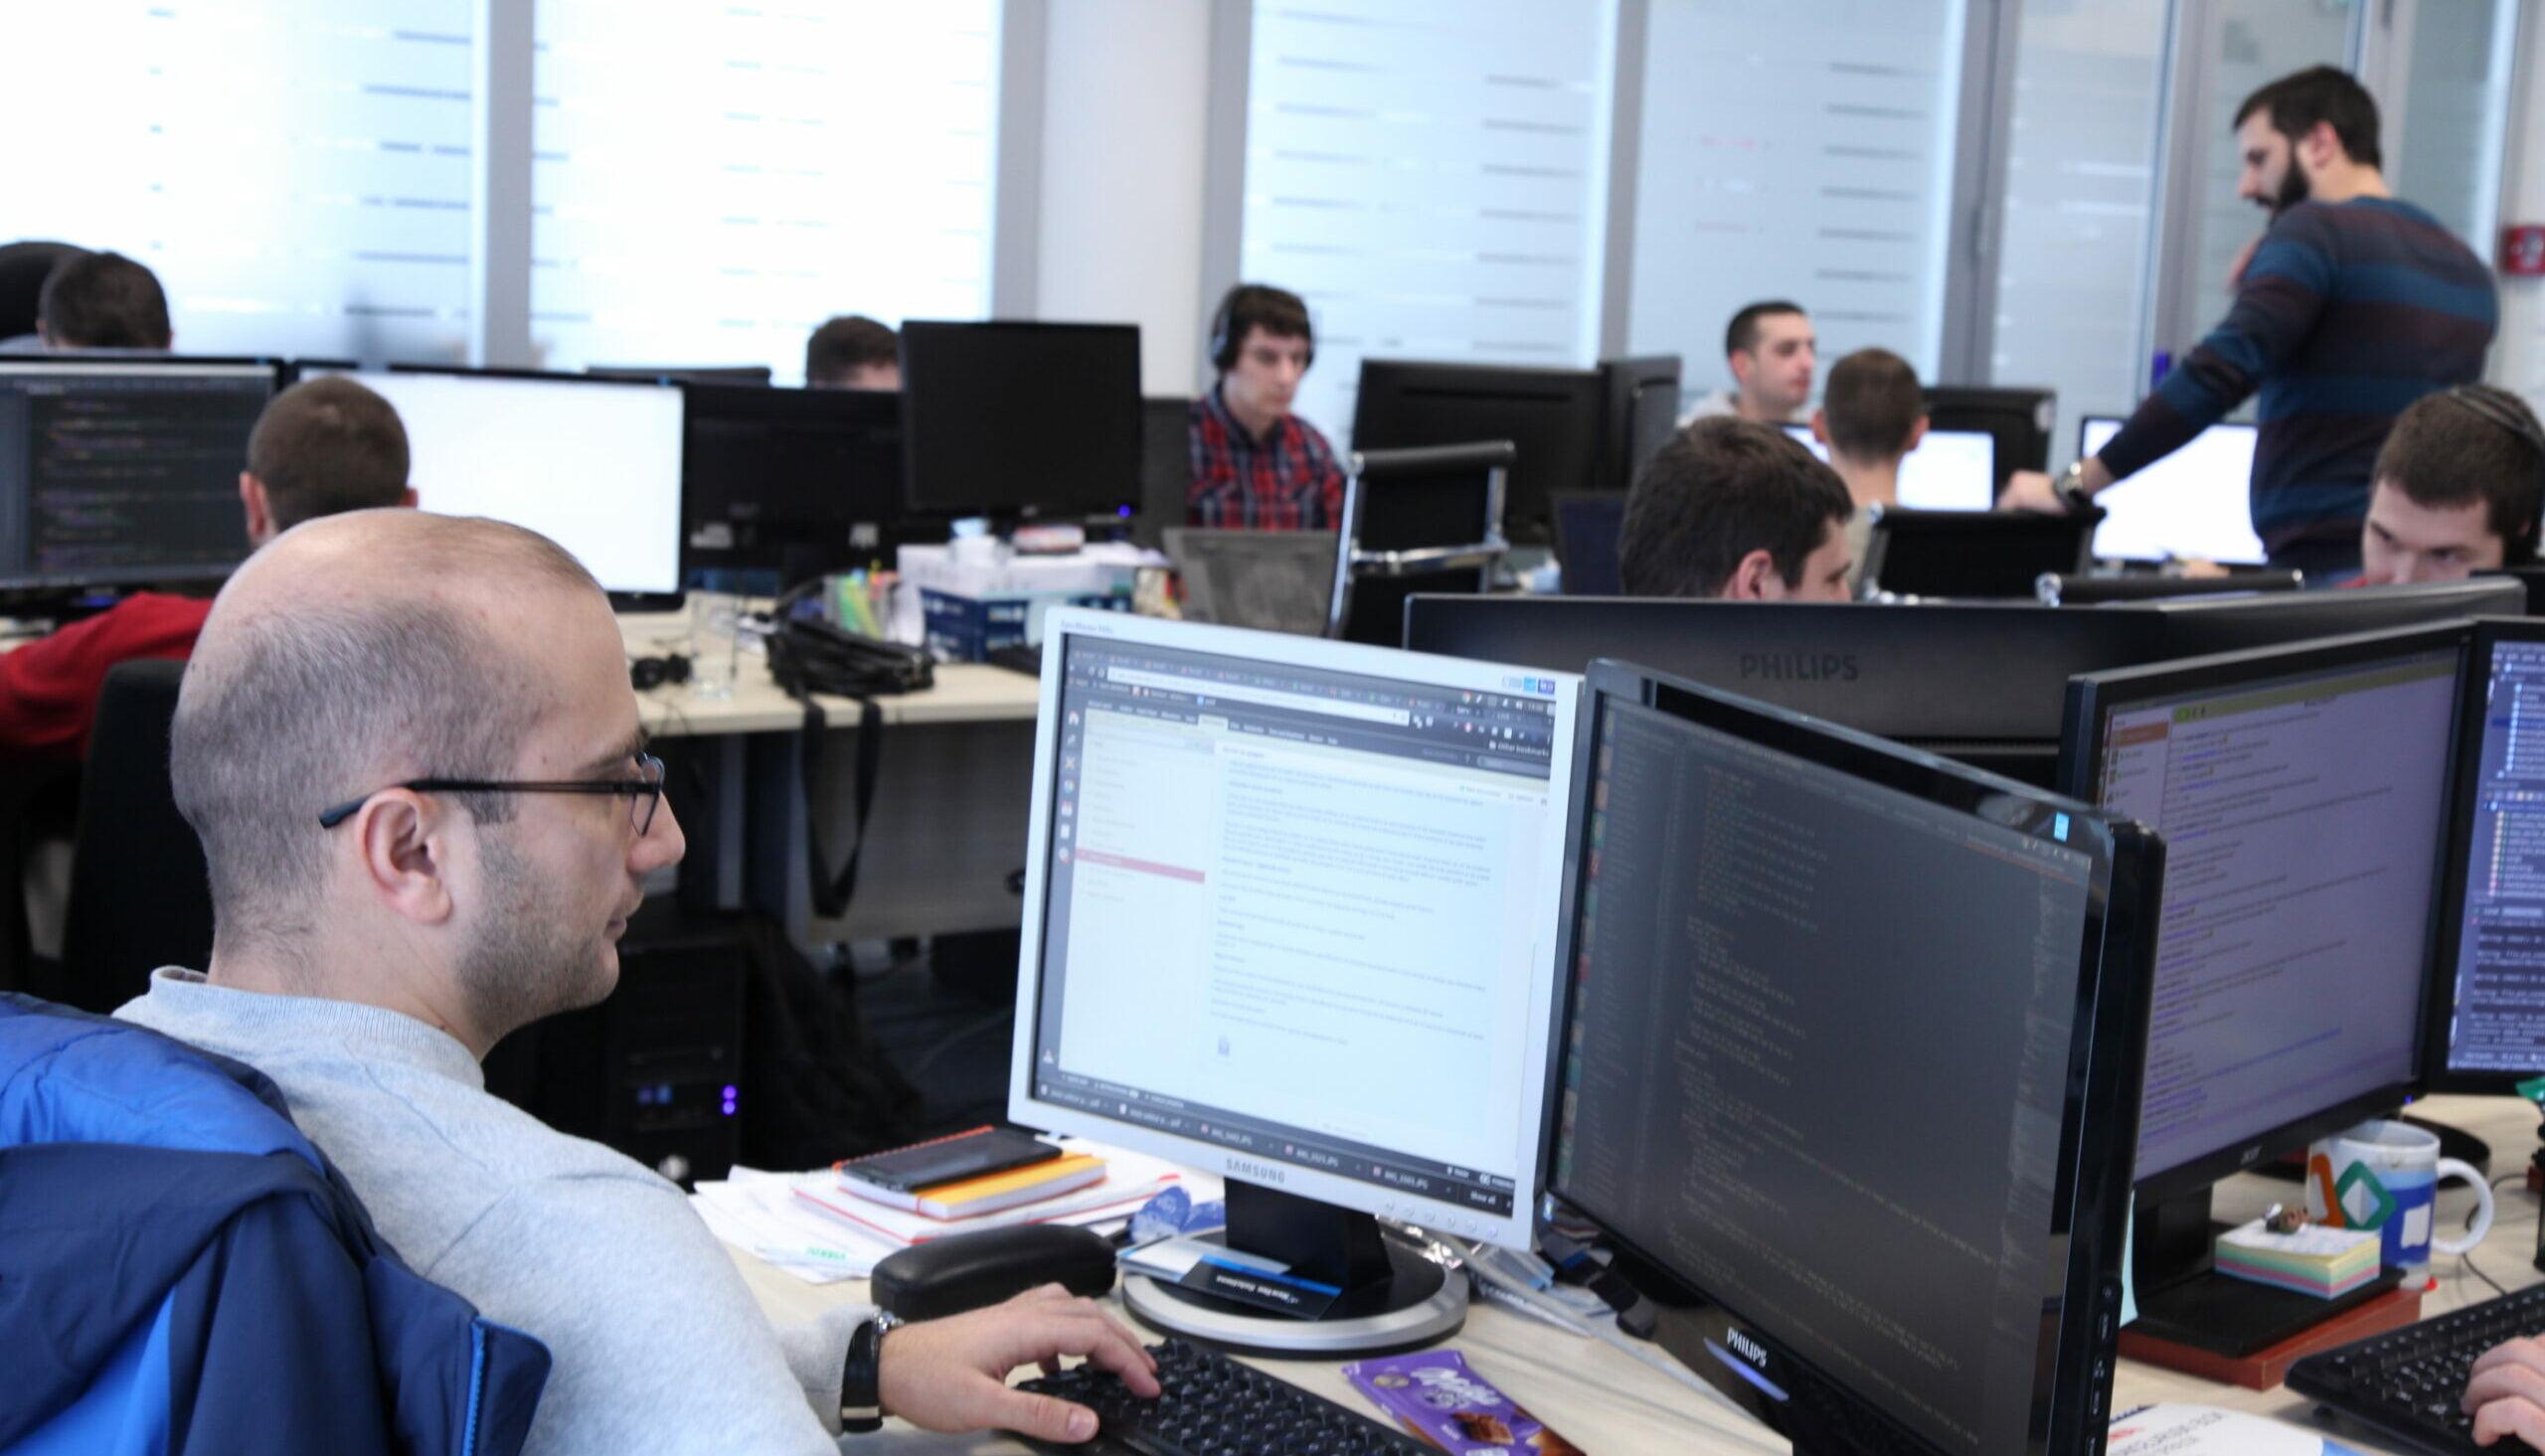 NewTec mobile development